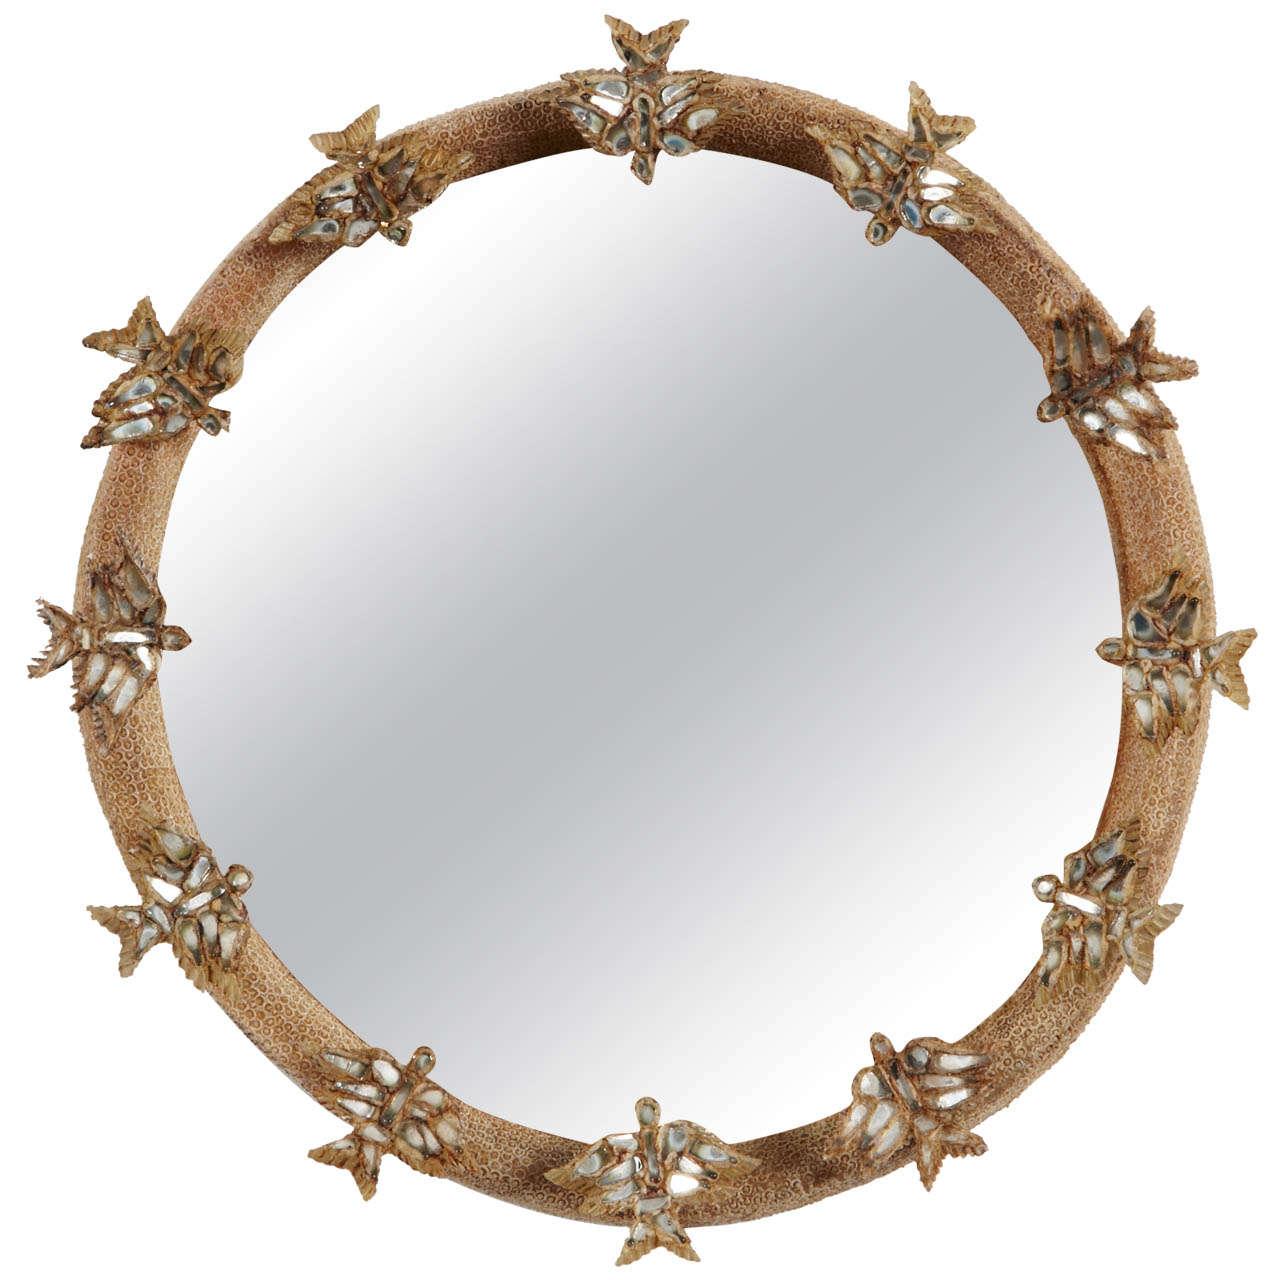 Line vautrin skylark mirror miroir aux alouettes at 1stdibs for Miroir aux alouettes